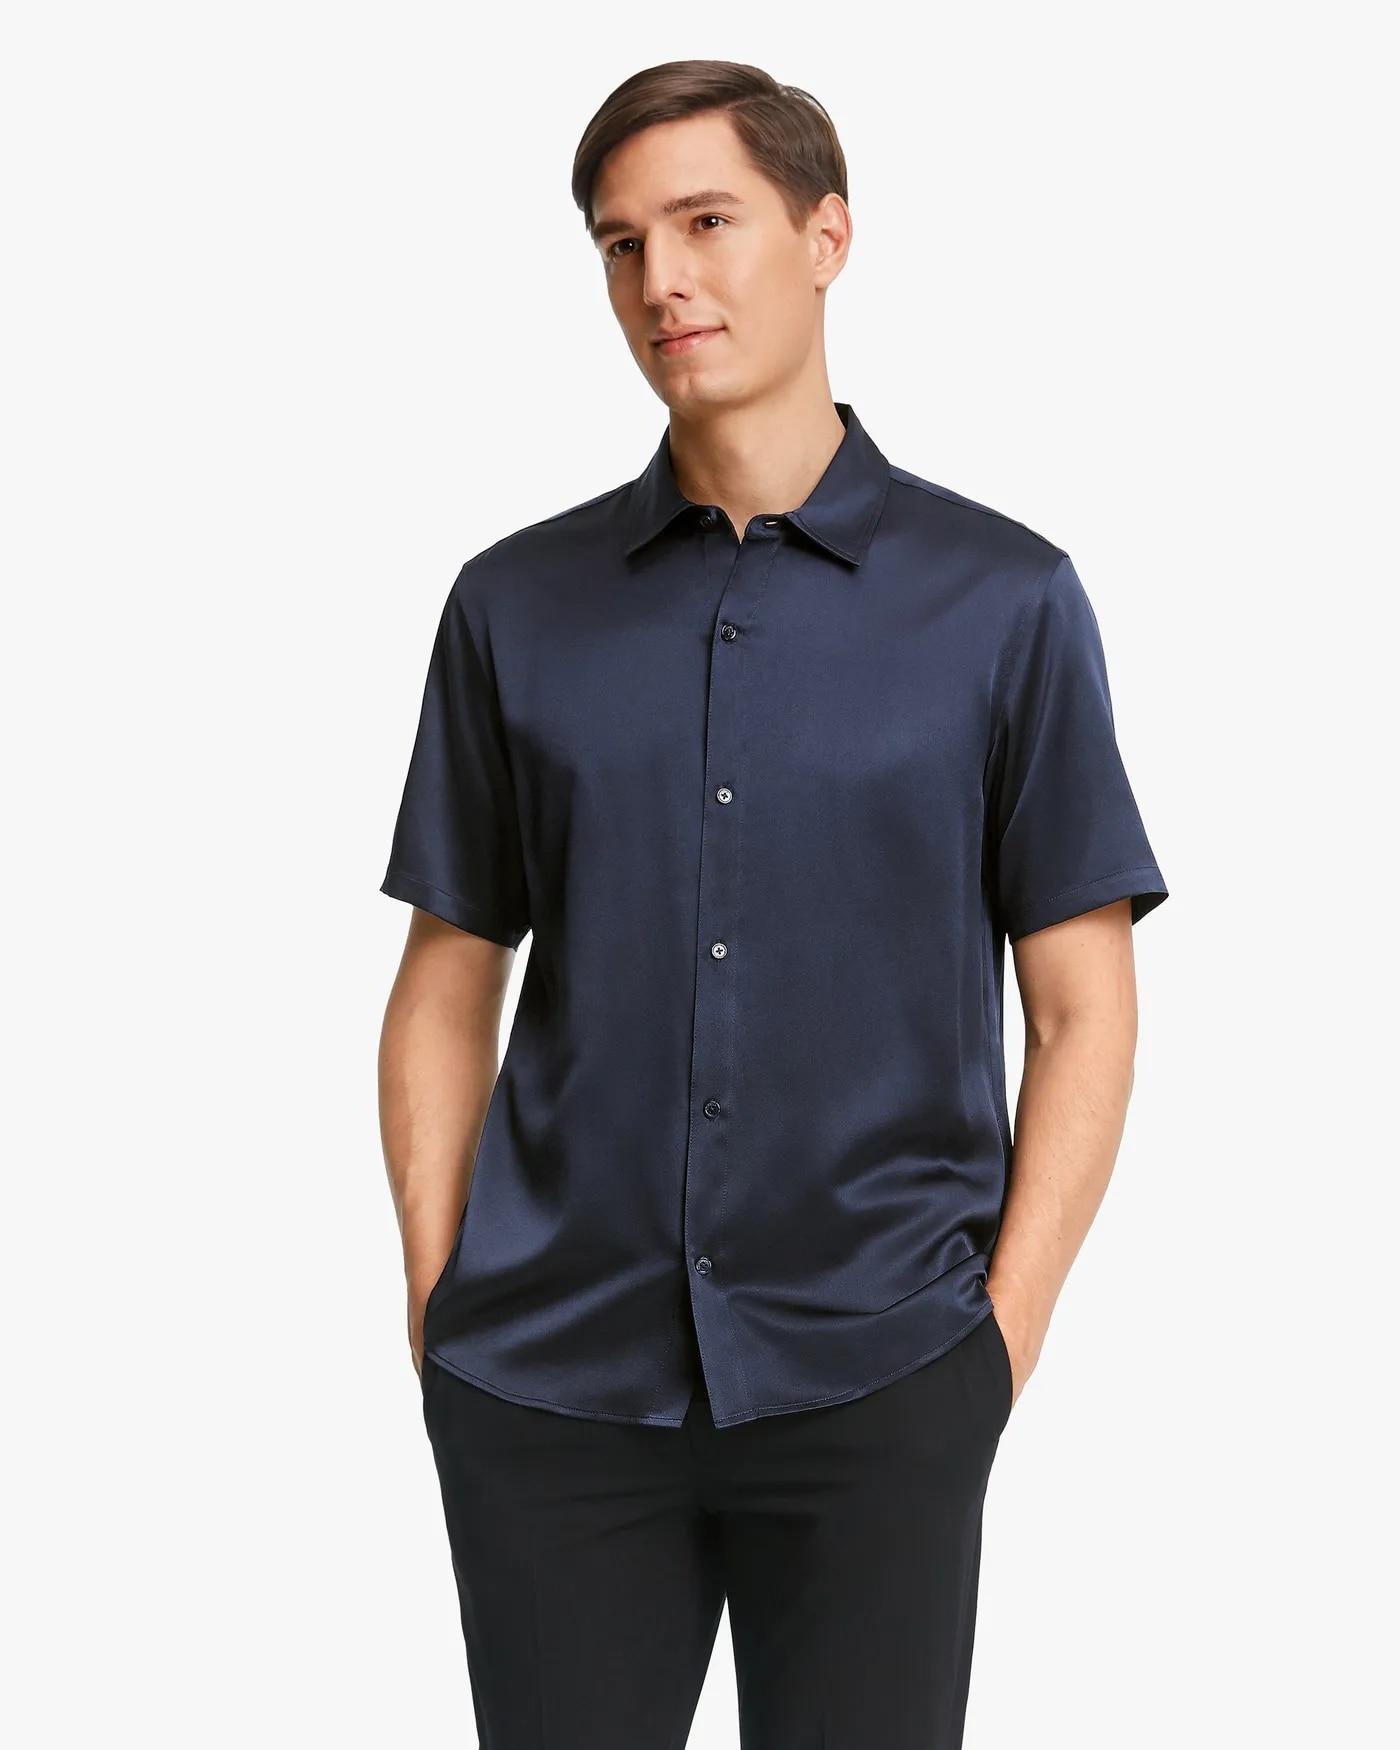 Luxury Short-Sleeved 19MM Pure Silk Shirt For Men Short-Sleeved T Shirt